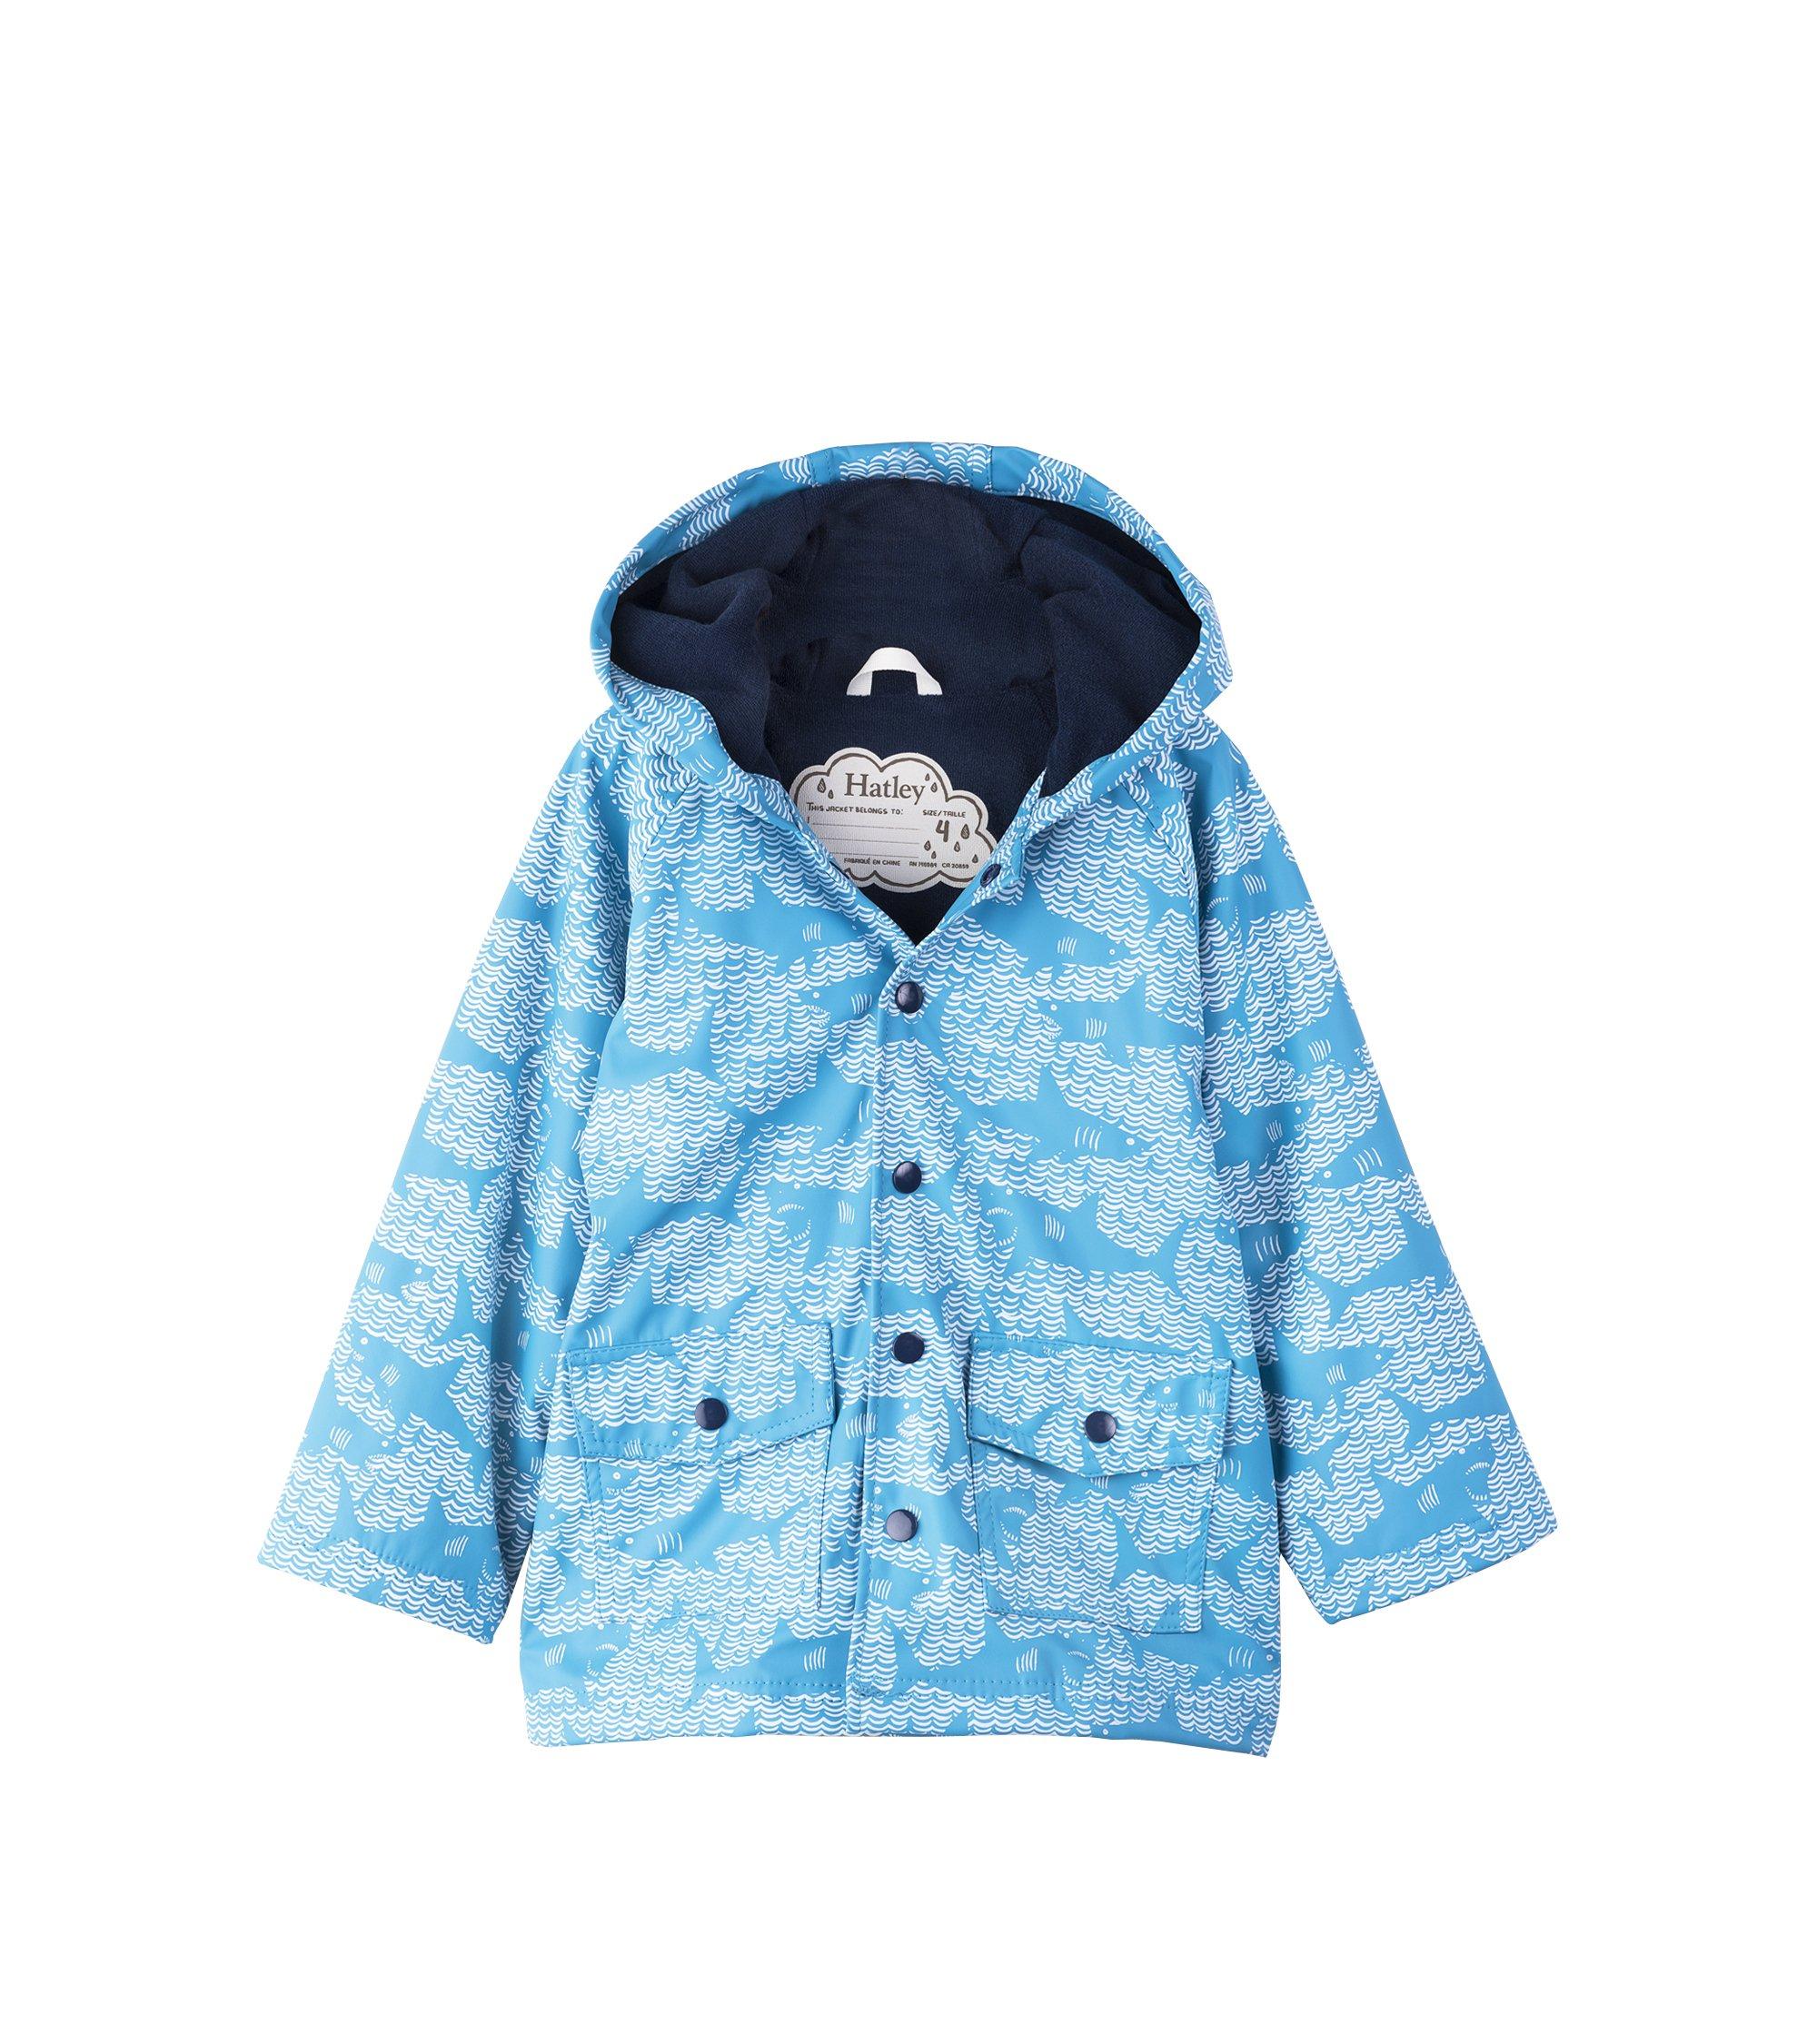 Hatley Kids Baby Boy's Shark Alley Classic Raincoat (Toddler/Little Kids/Big Kids) Blue 4 US Little Kid